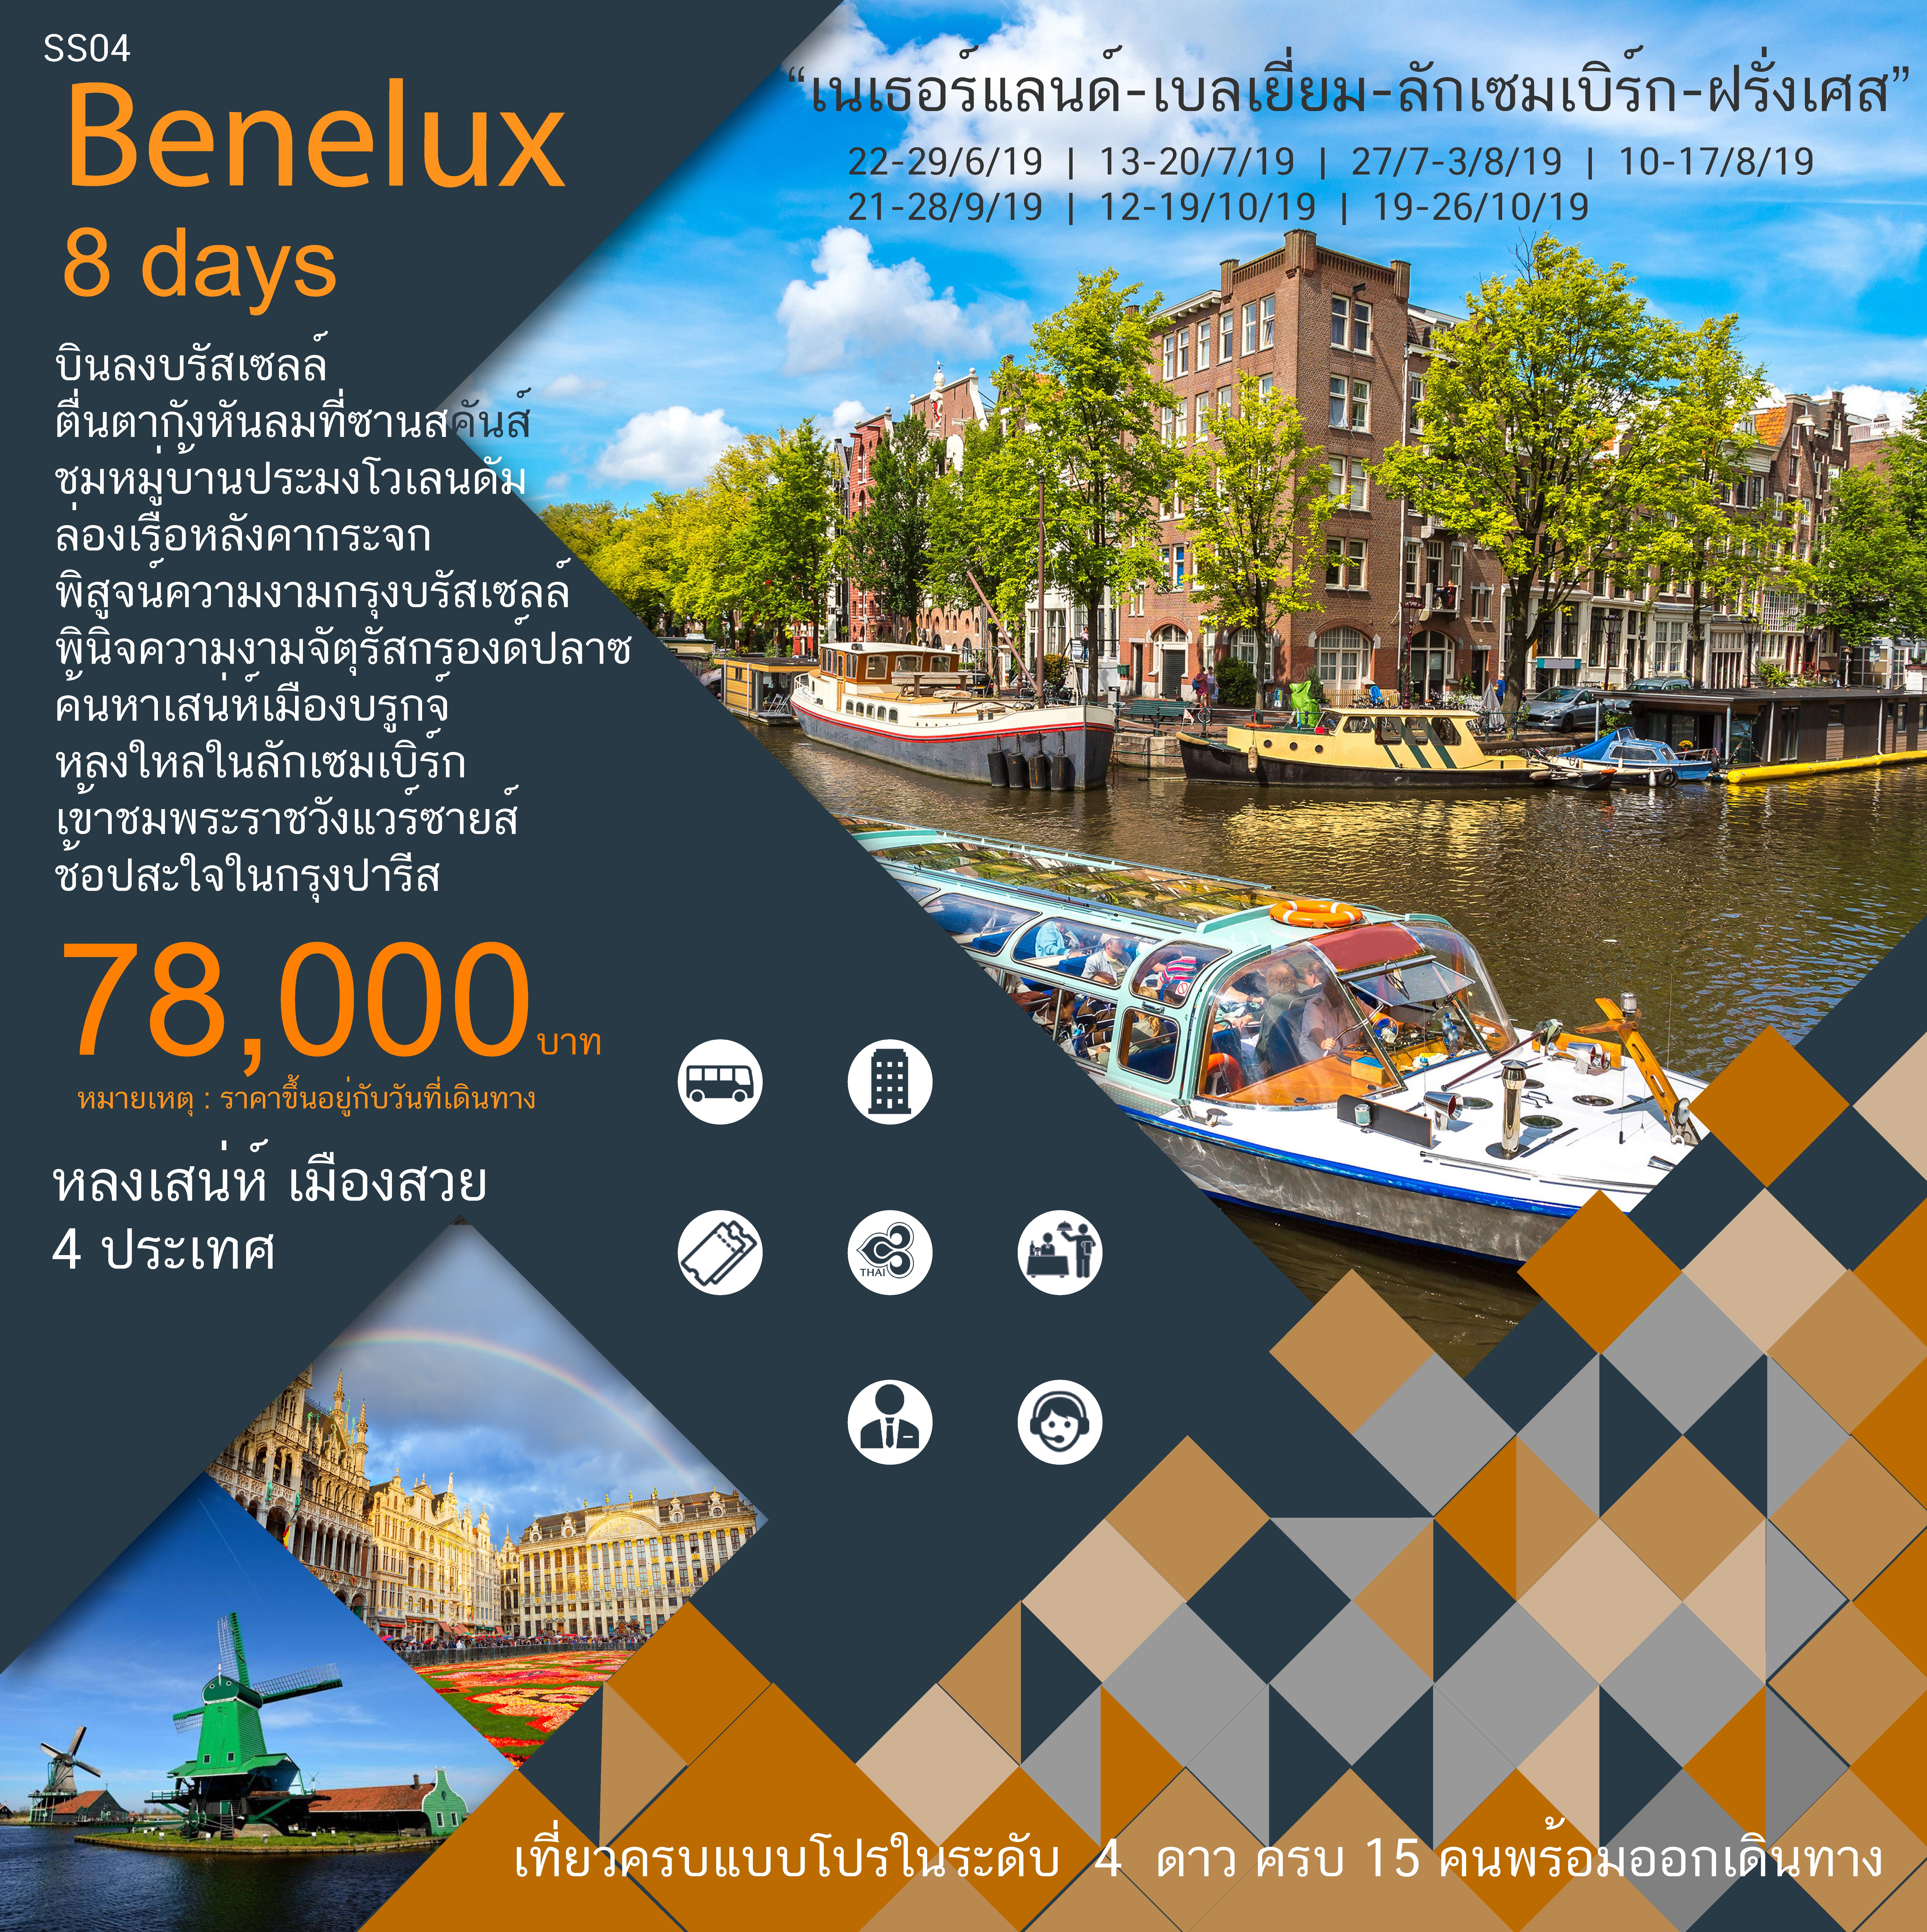 SS04_benelux  8 D